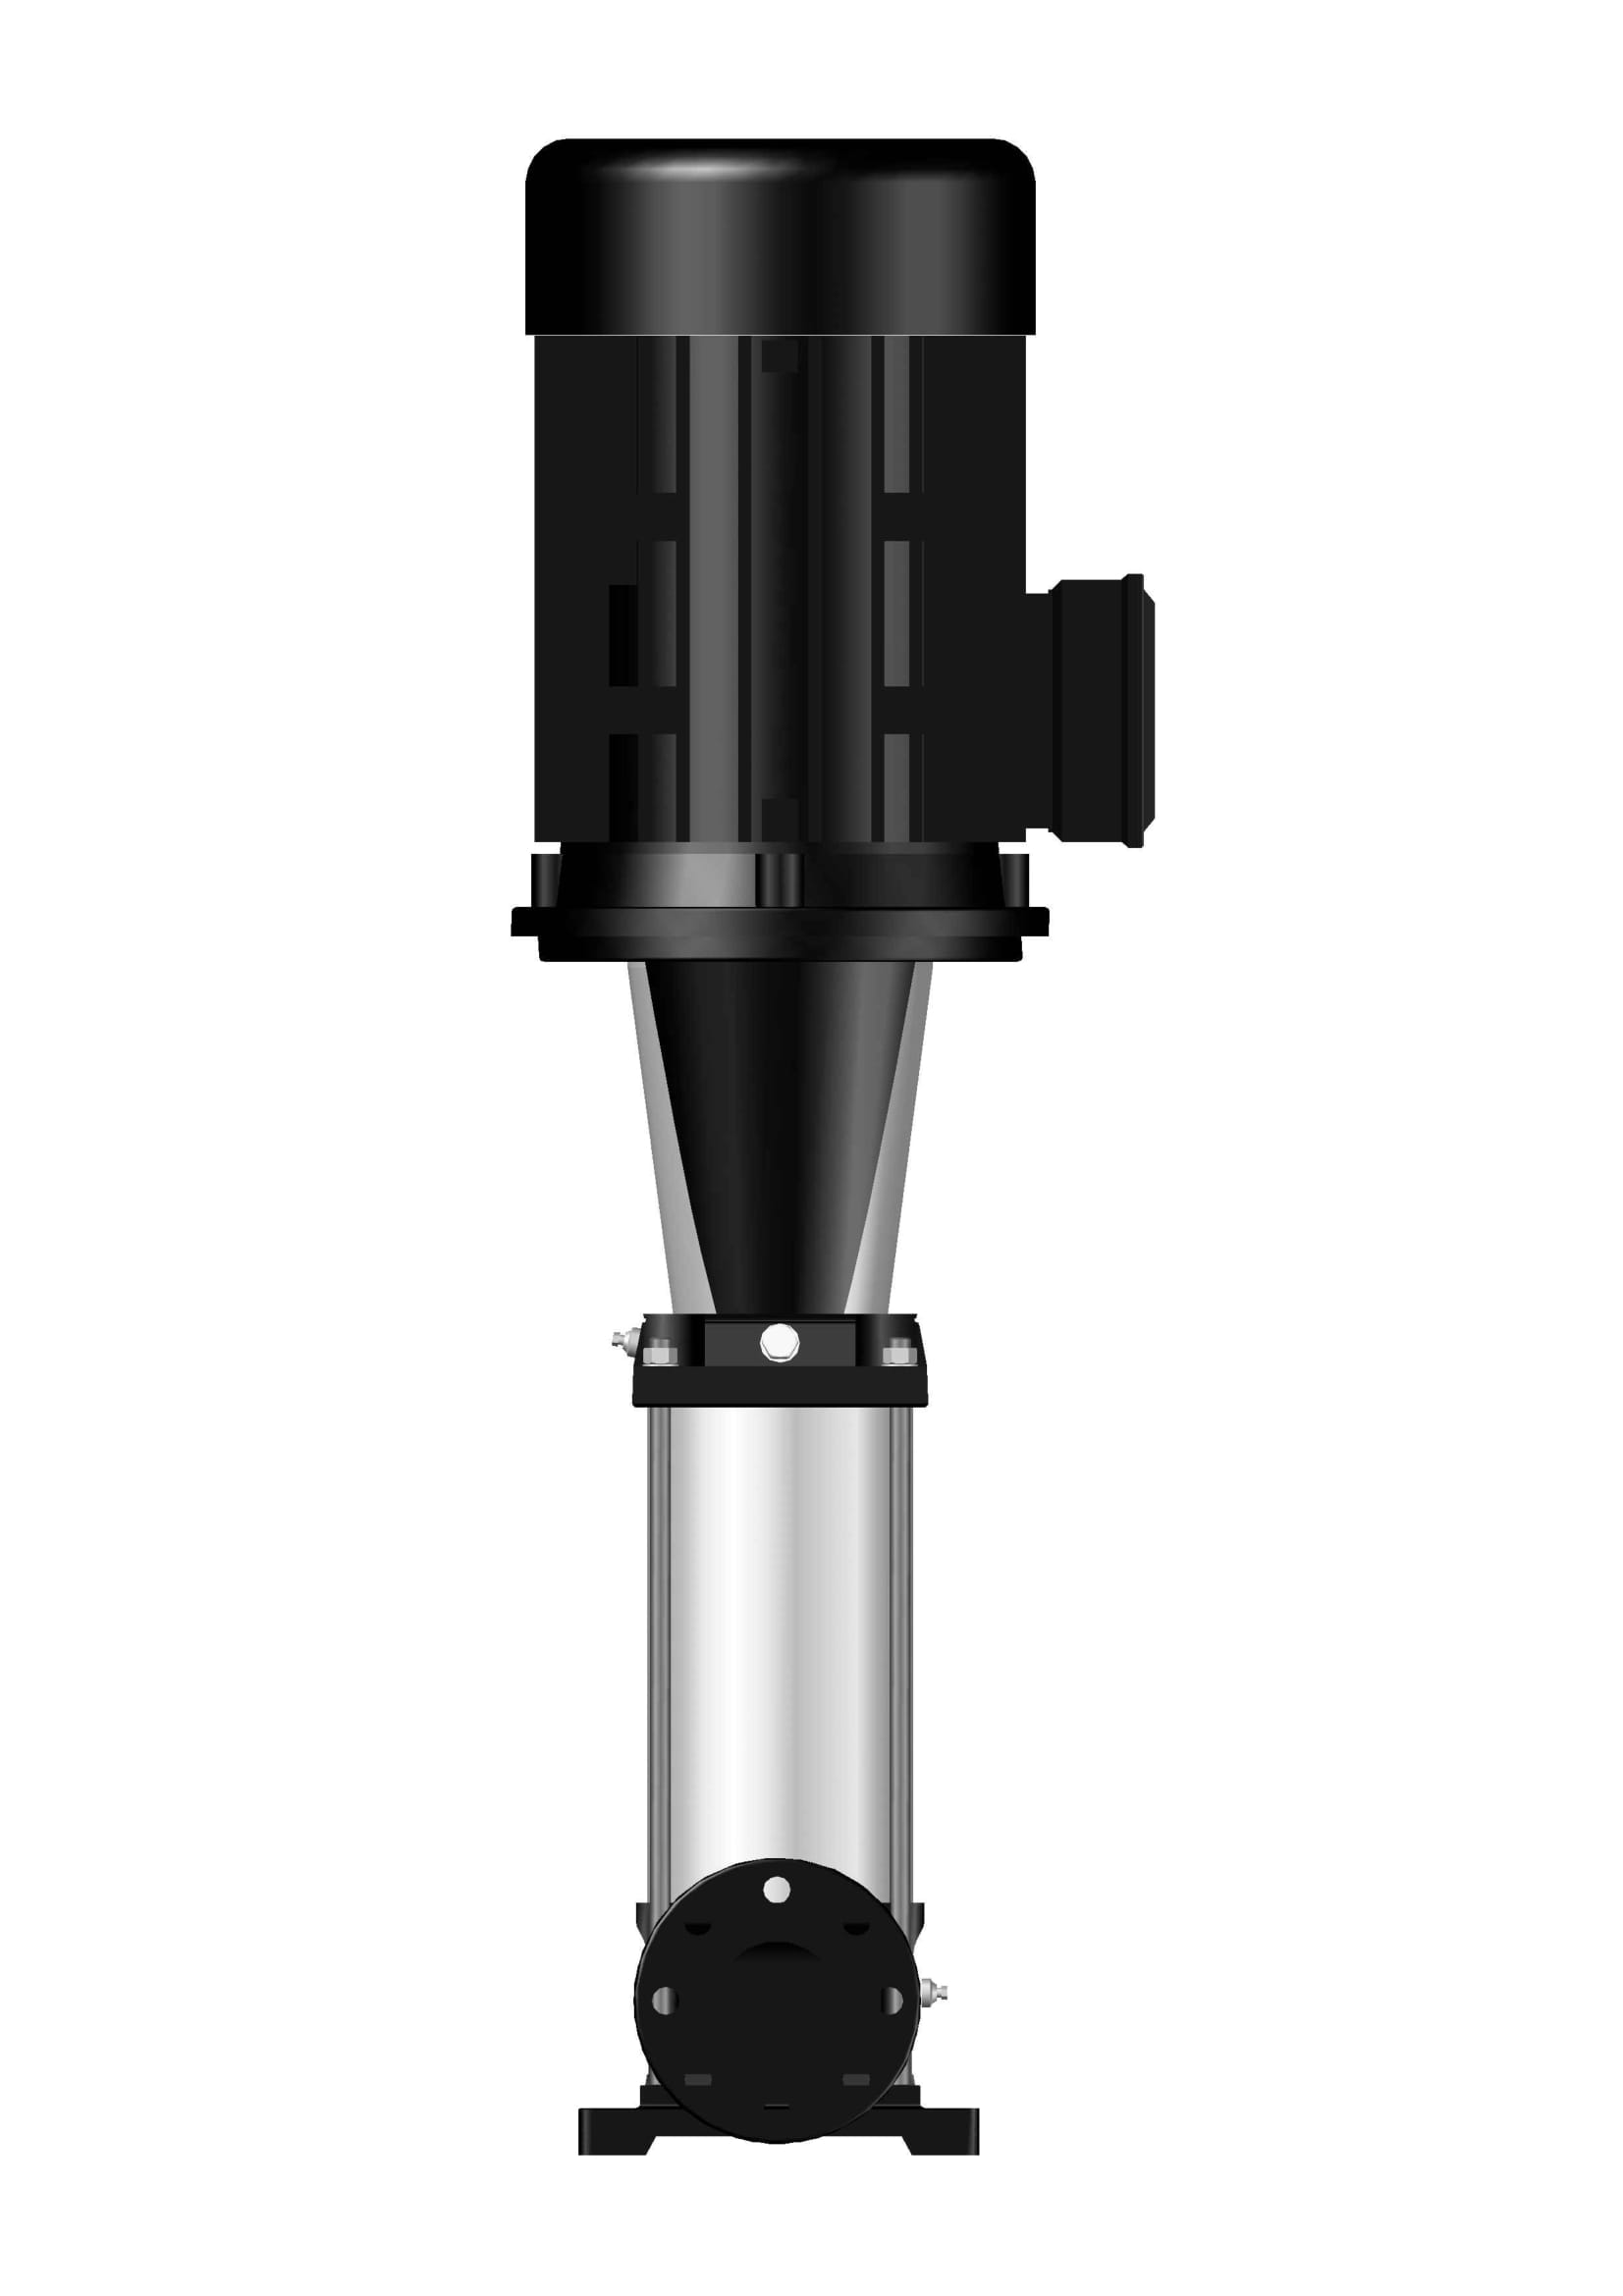 BV 64-05-01